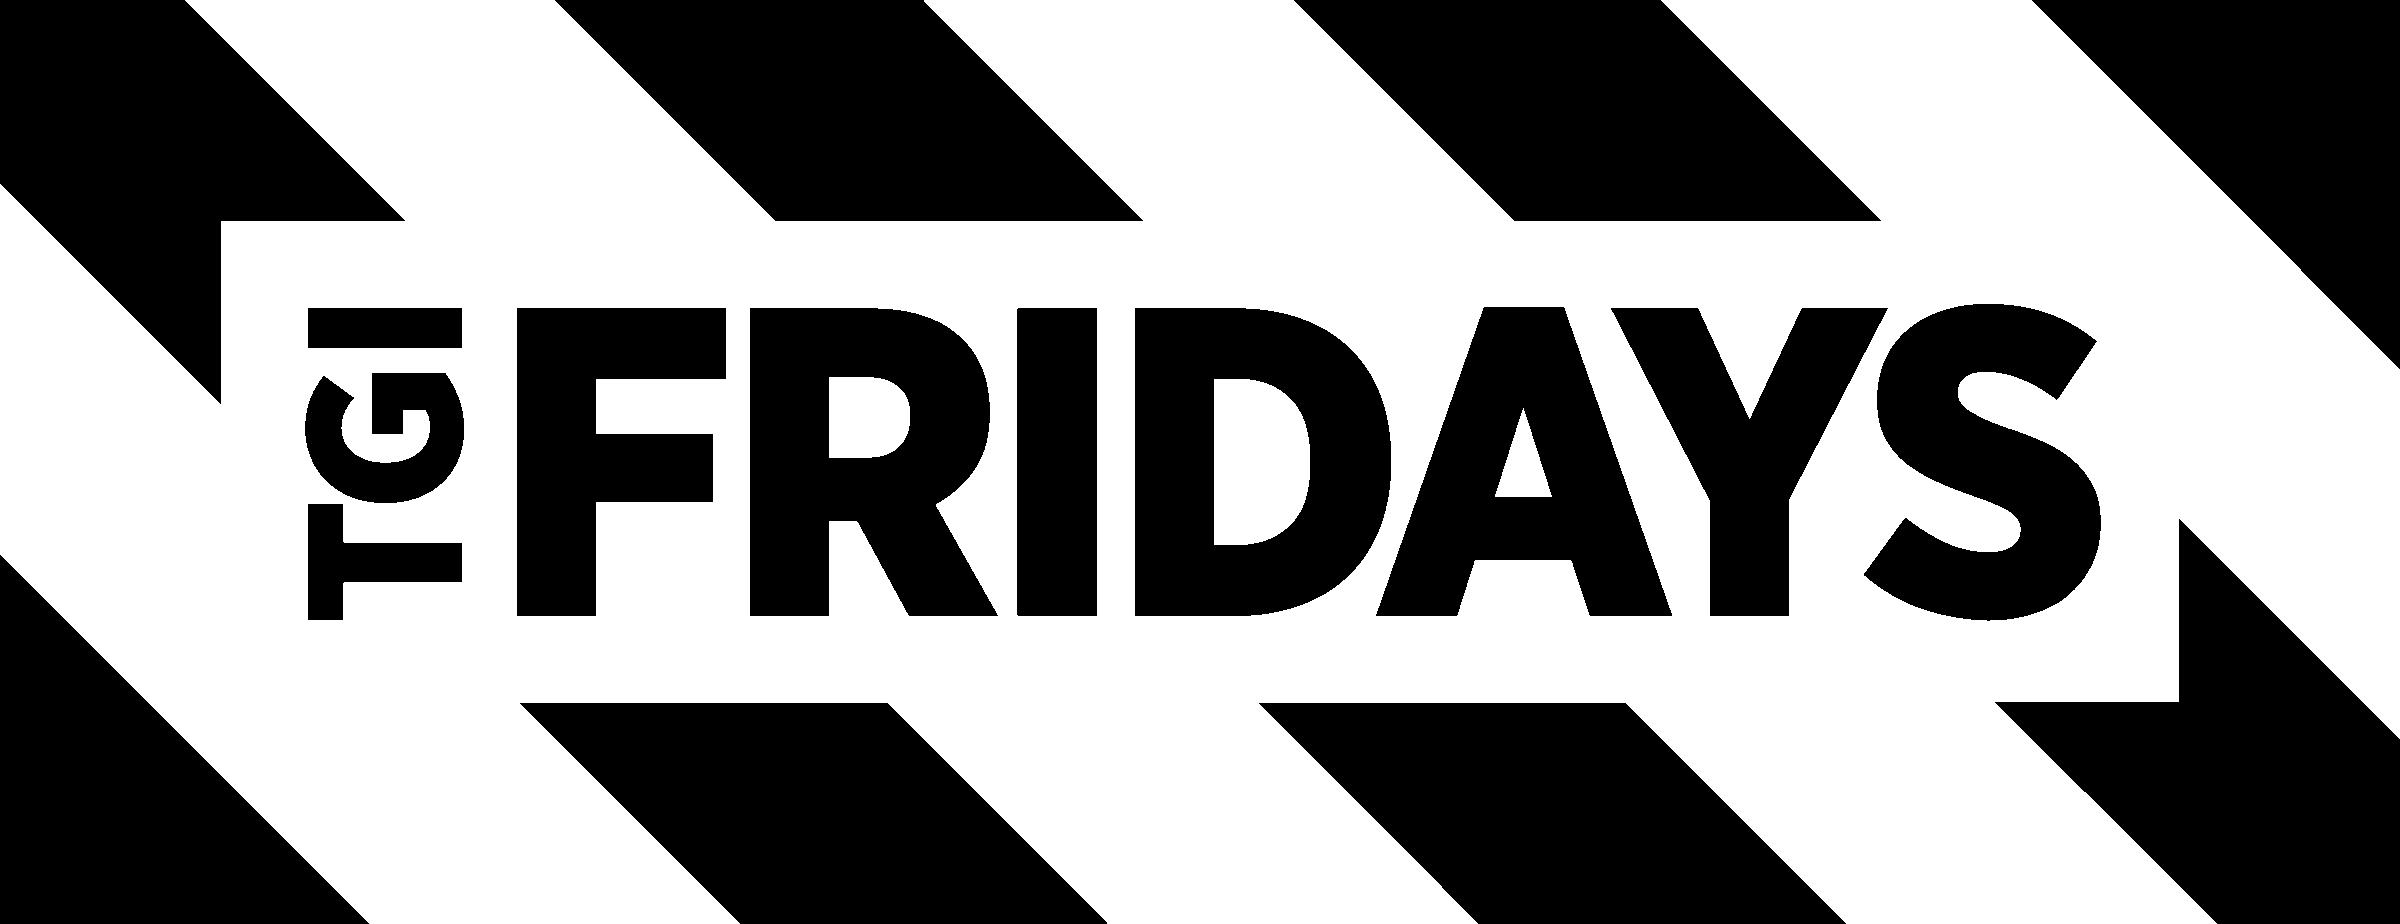 Download Tgi Fridays Logo Black And White.